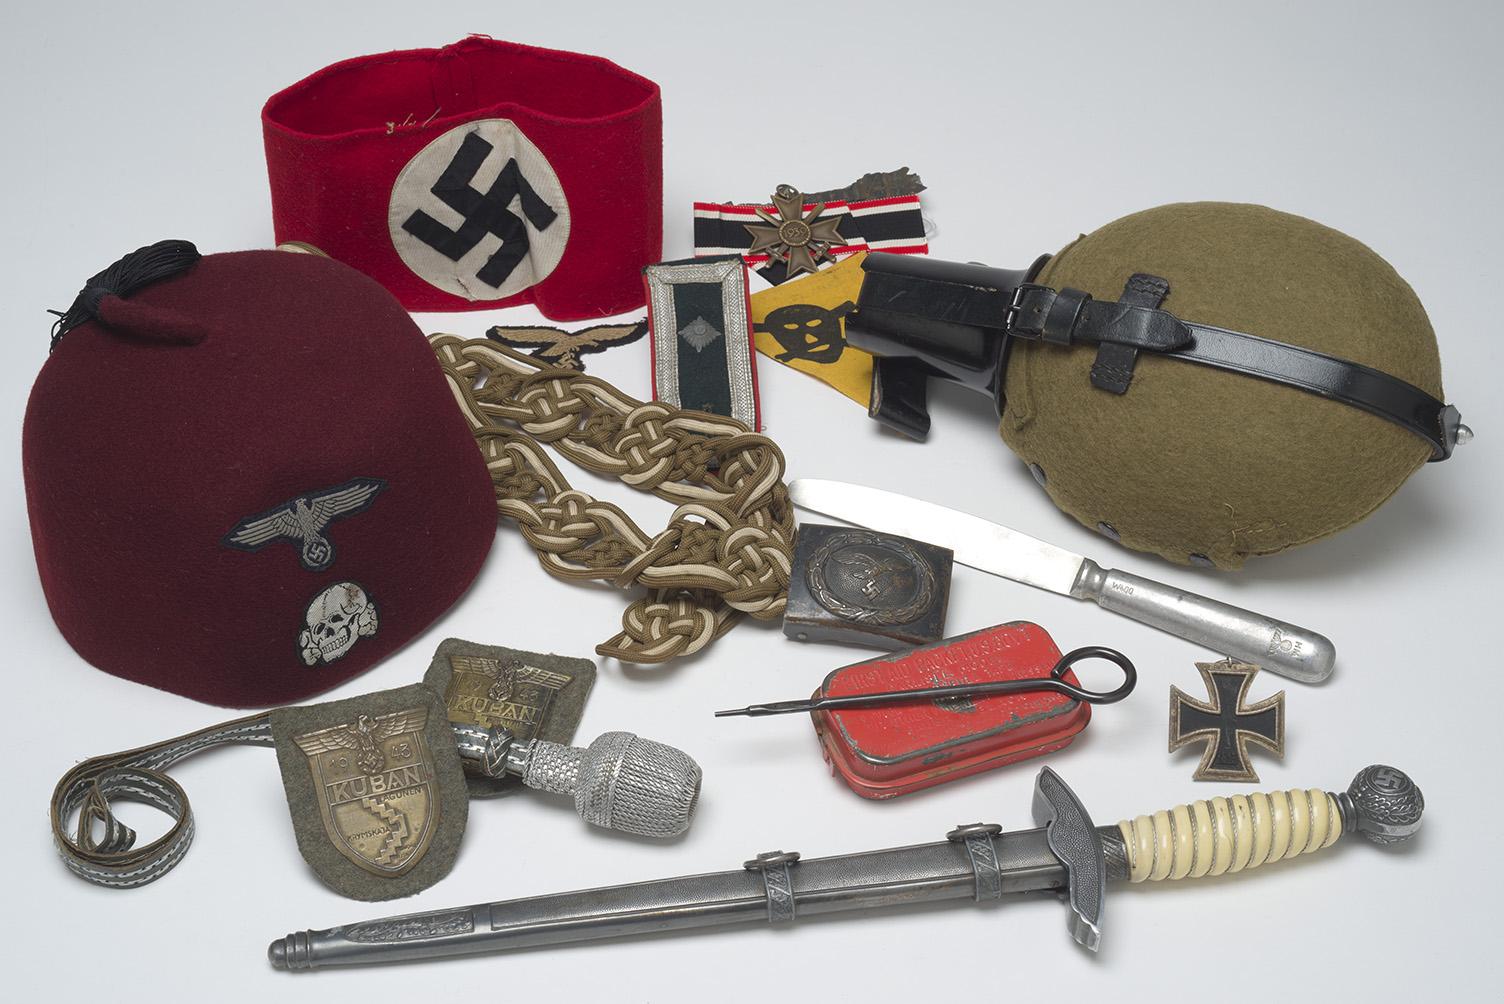 Nazi military artifacts